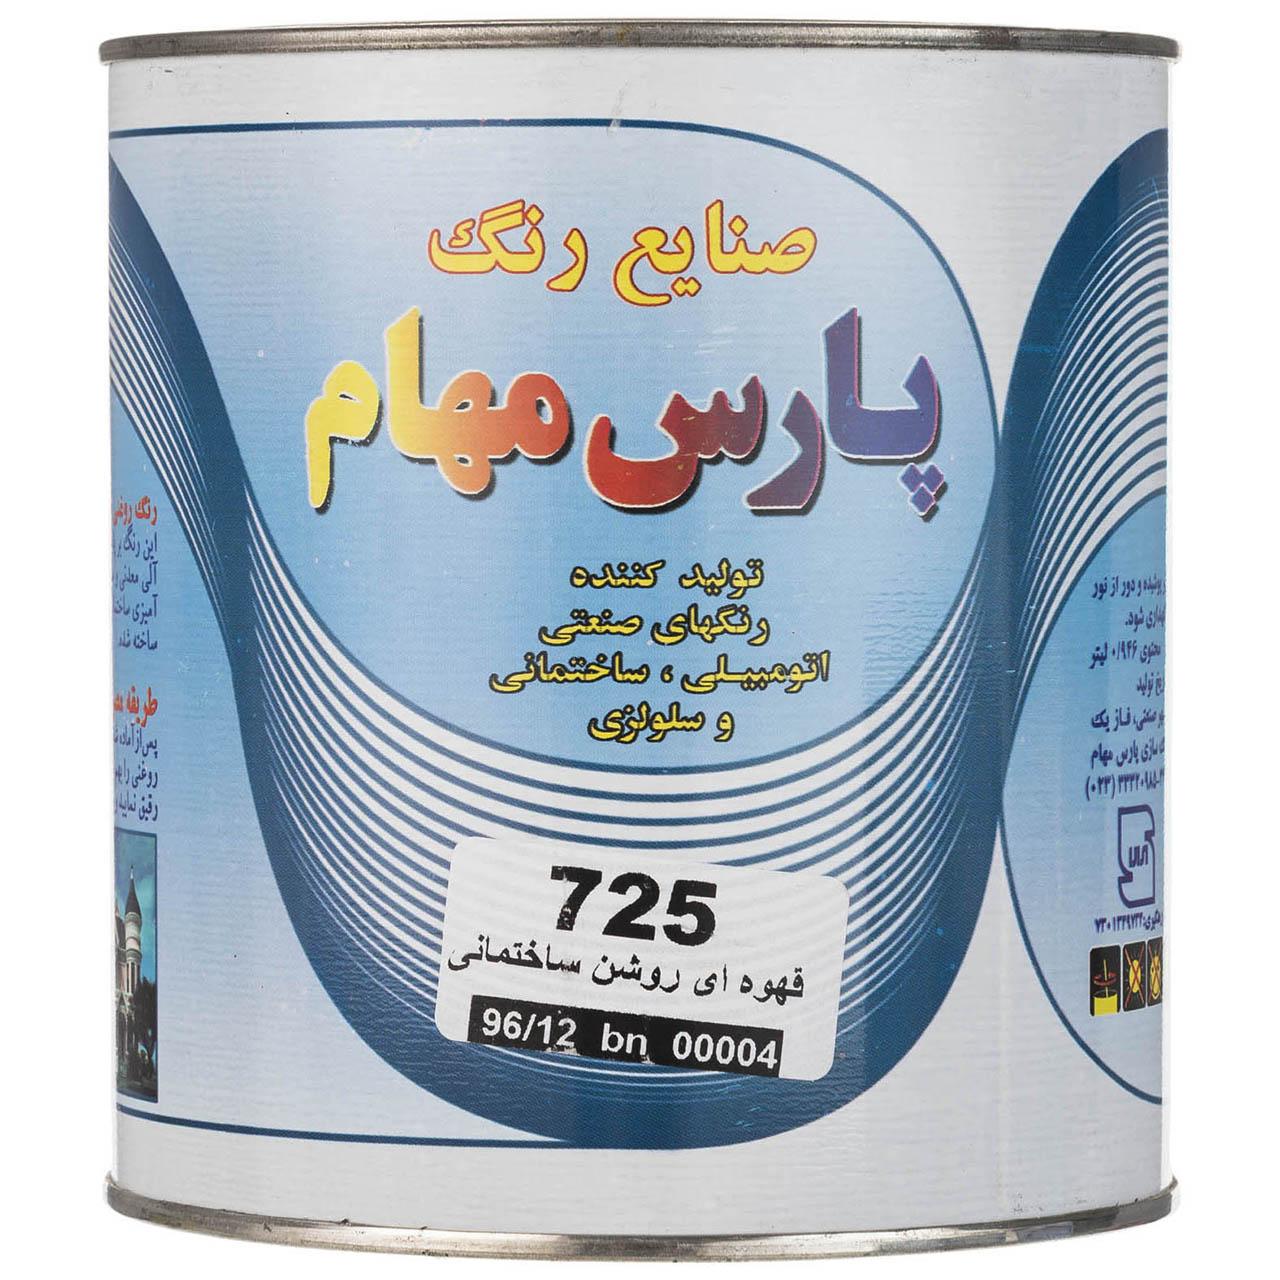 قیمت قوطی رنگ قهوه ای روشن پارس مهام کد 725 حجم 946 میلی لیتر